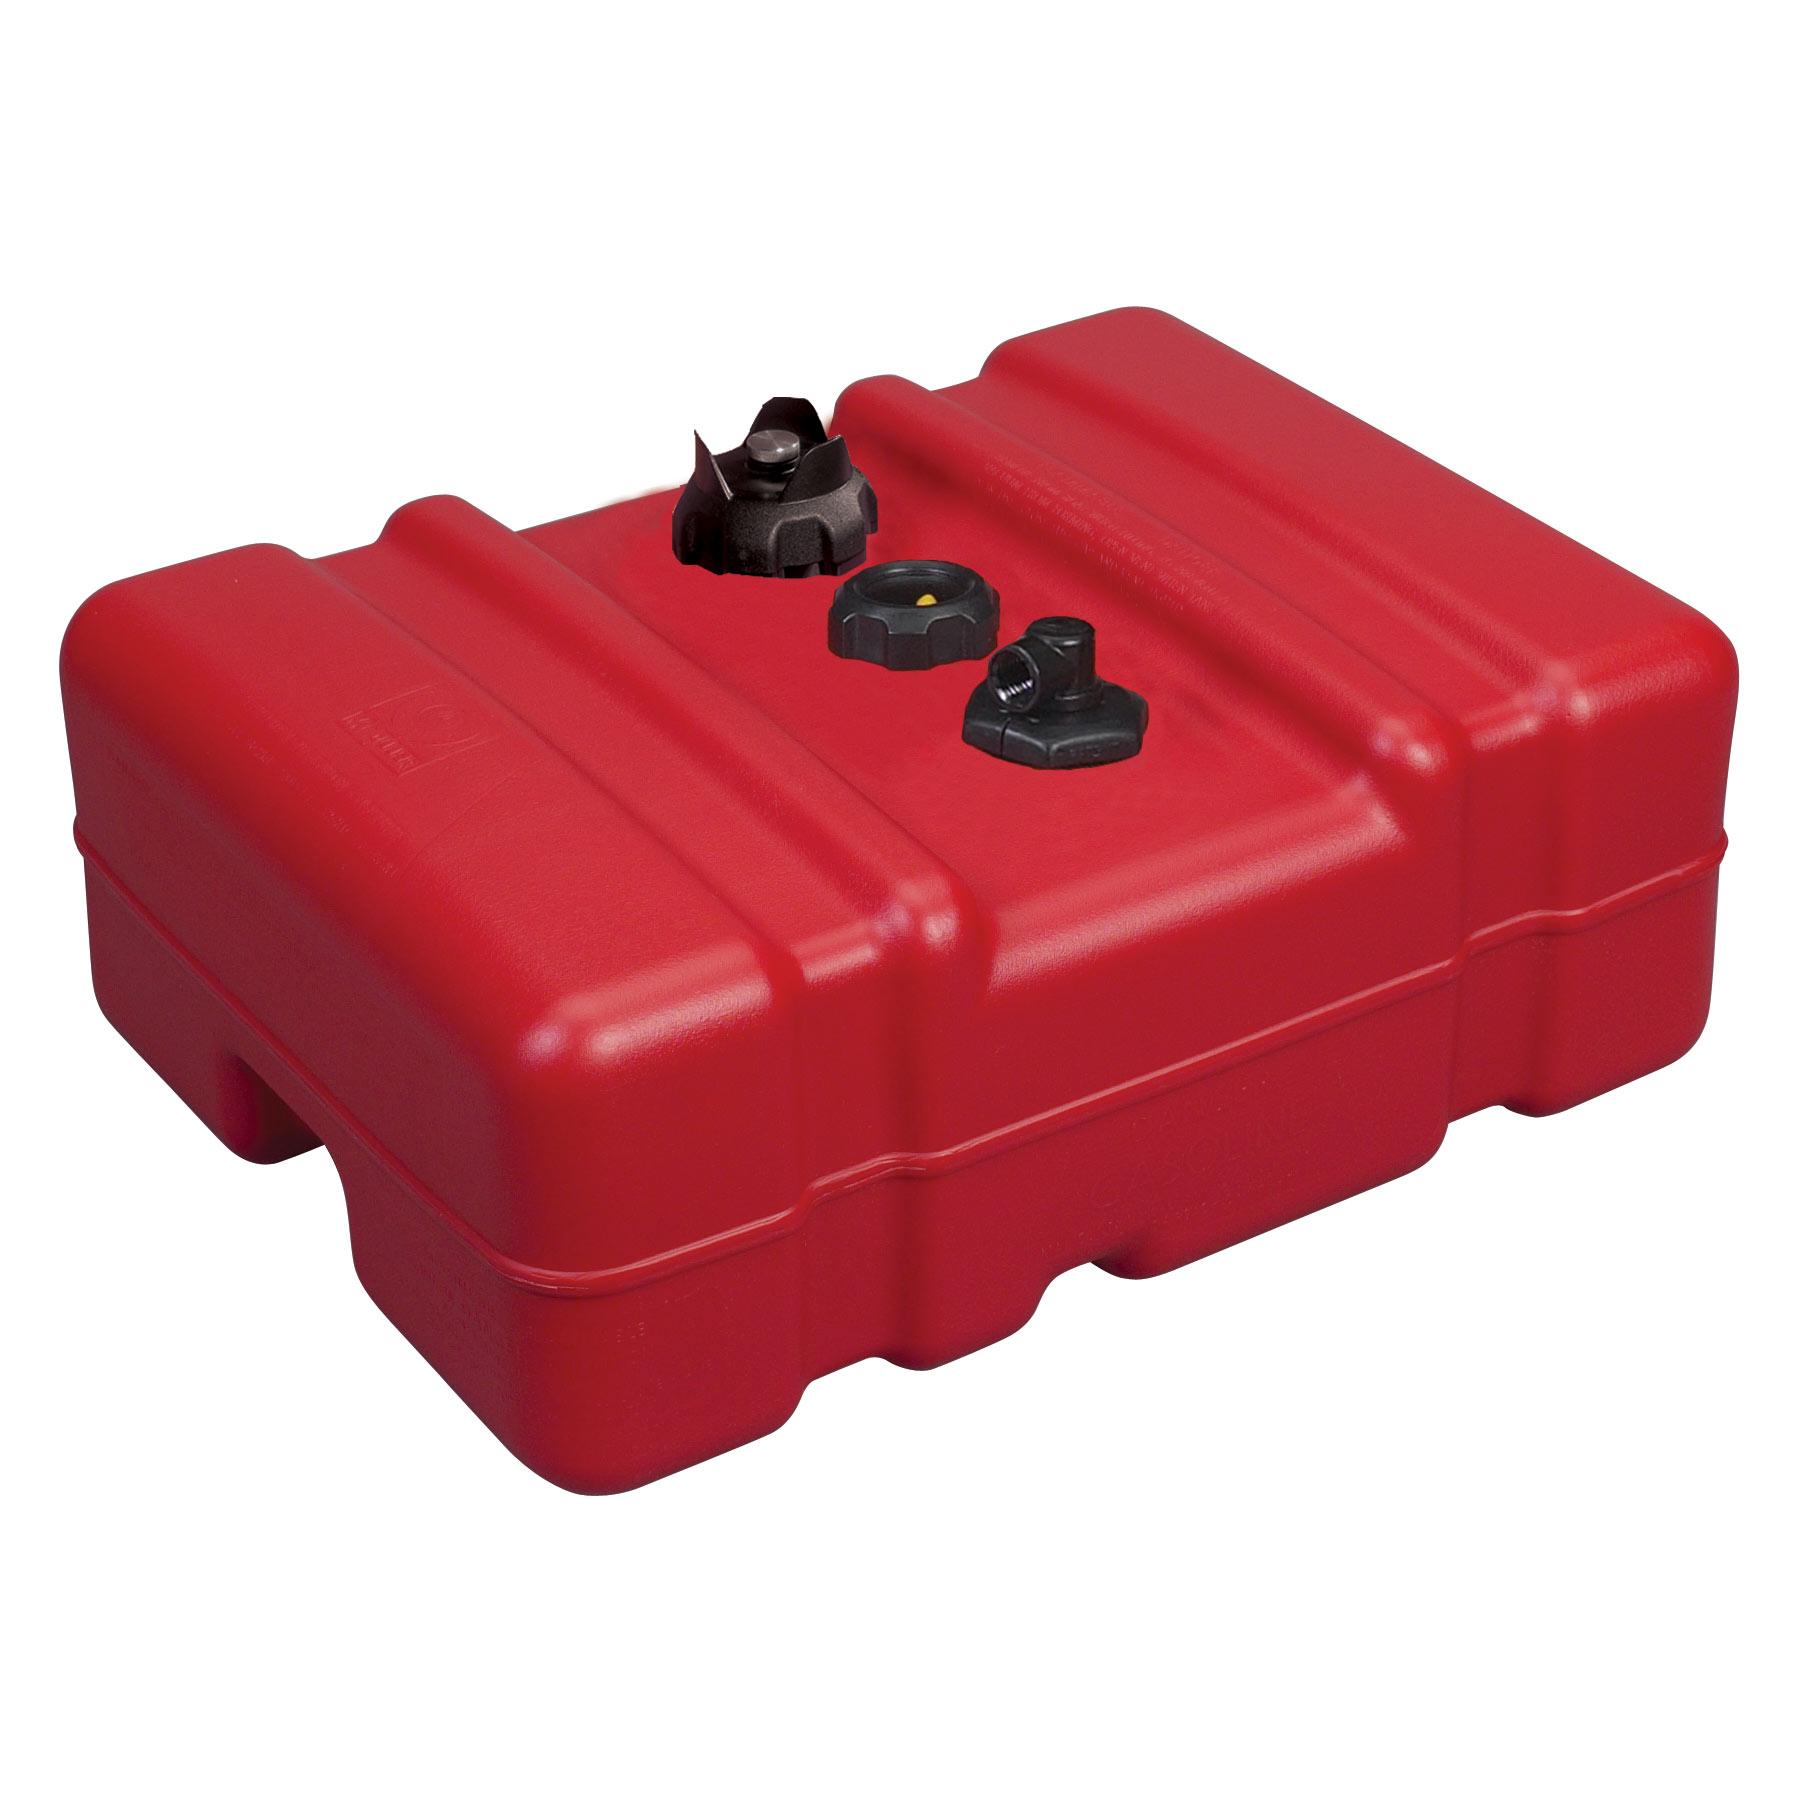 Moeller 630013lp 12 Gallon Lpt12 Portable Fuel Tank Tempo